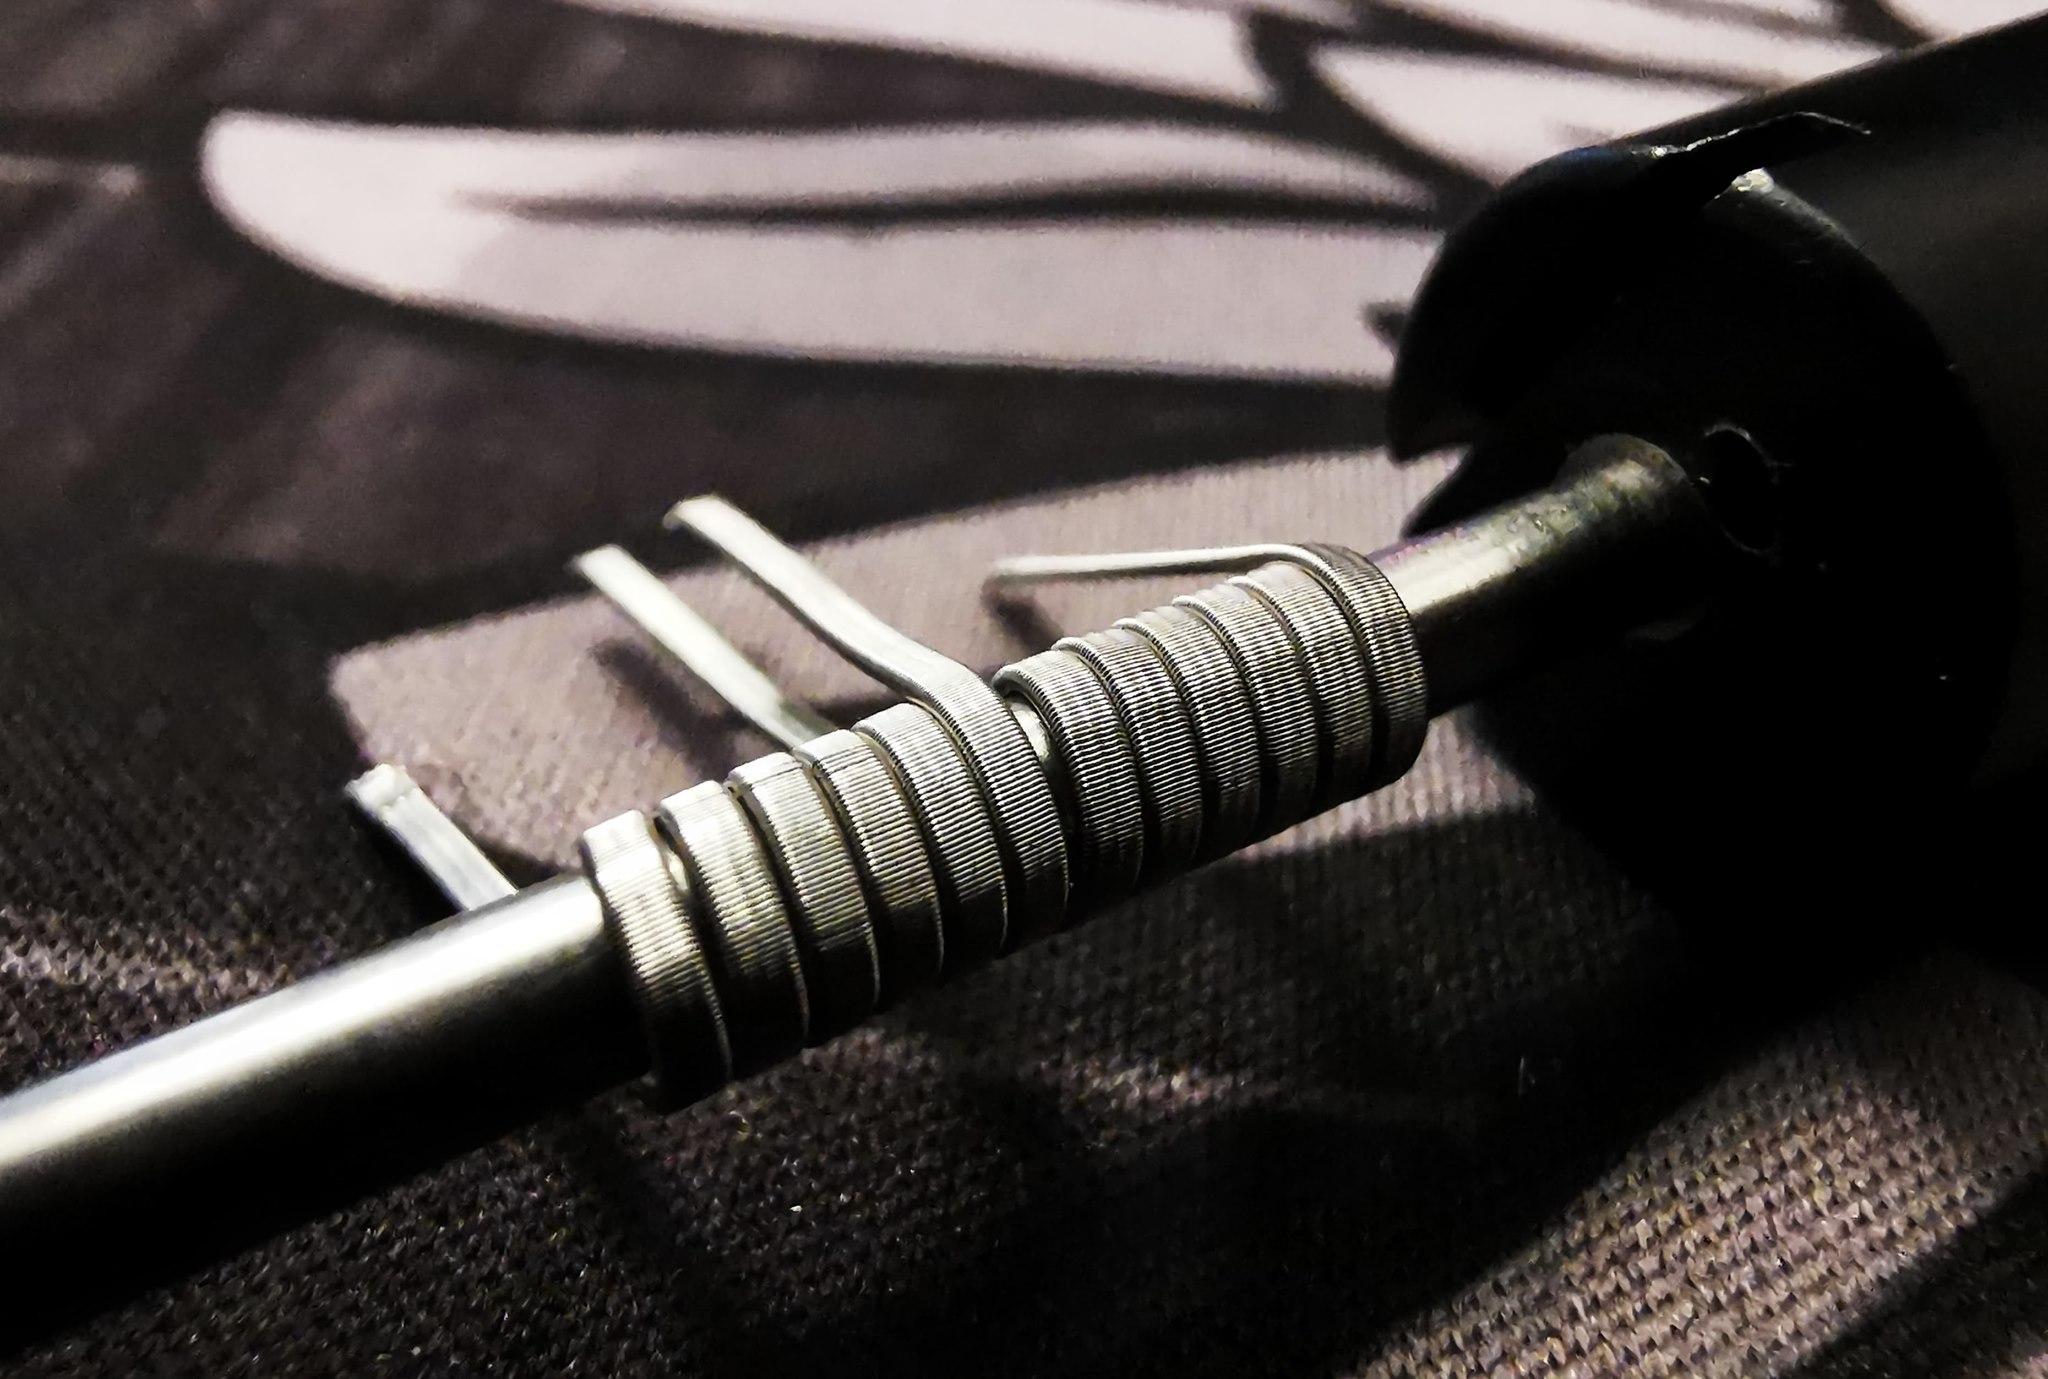 Vikingen Hand Made RBA Coils 3 Core Fused Clapton 0.12 Ohm